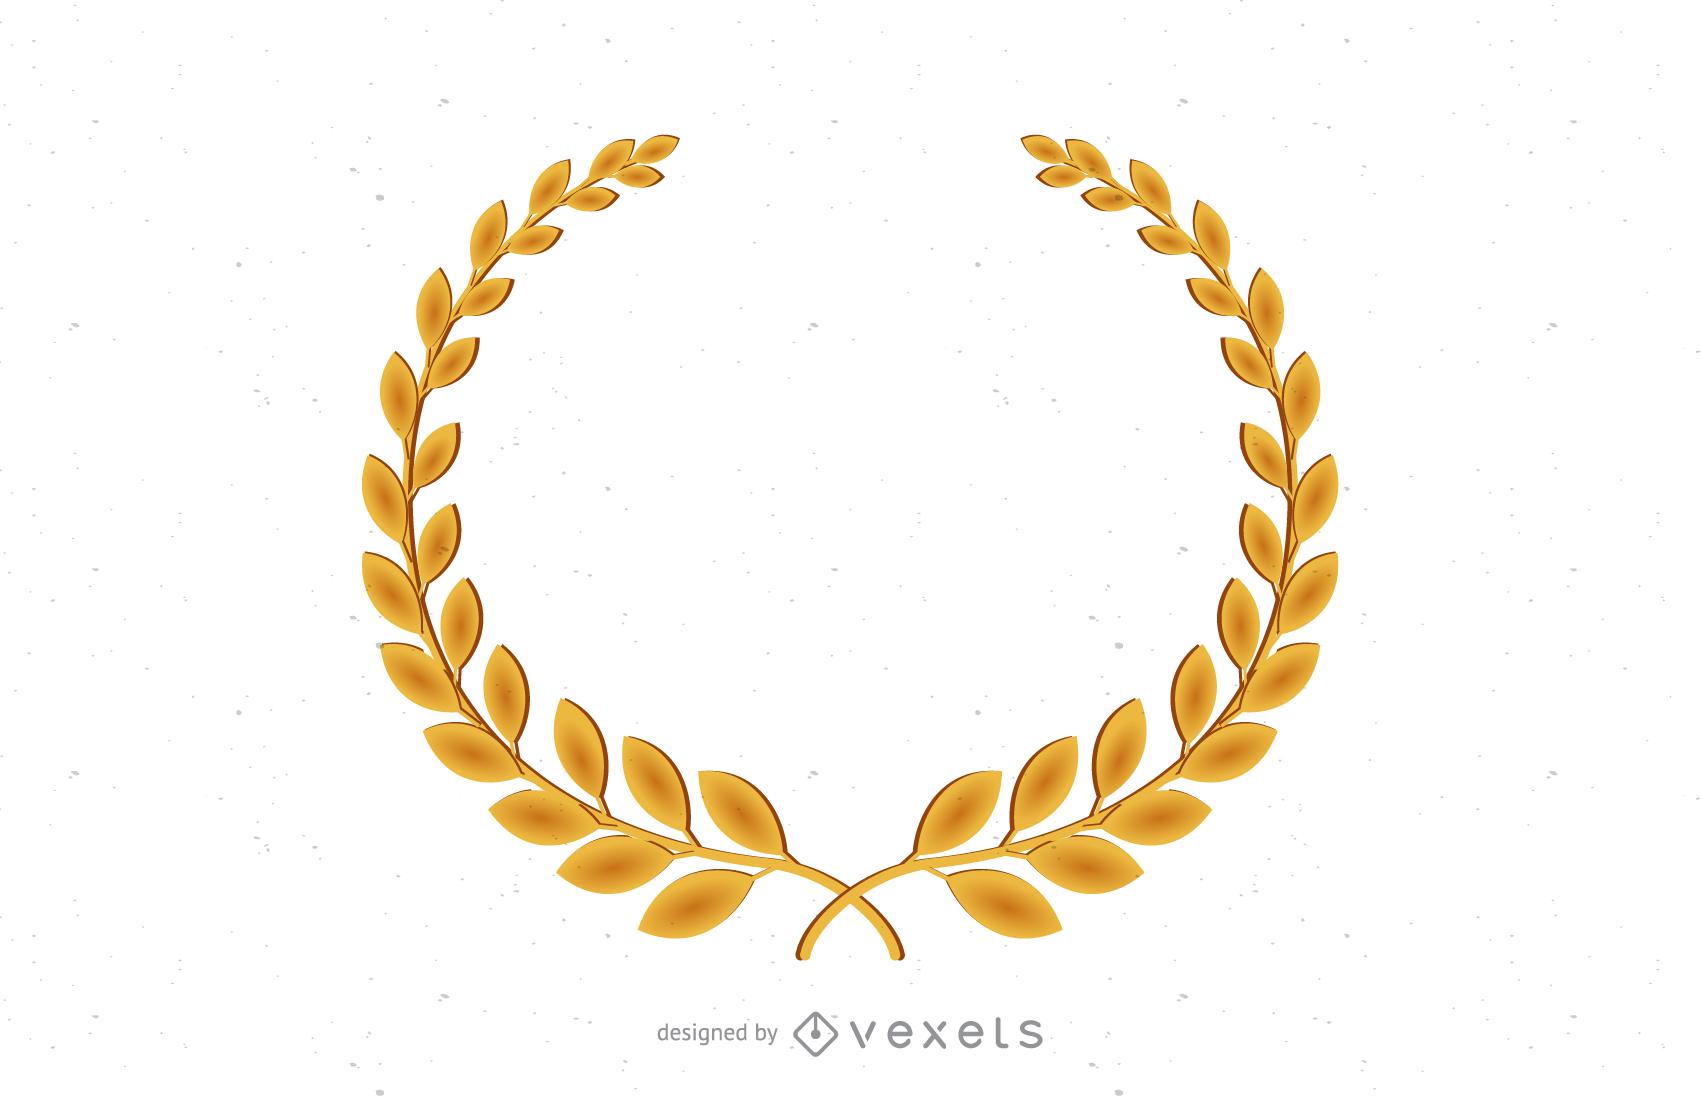 1701x1096 Golden Olive Branch Vector